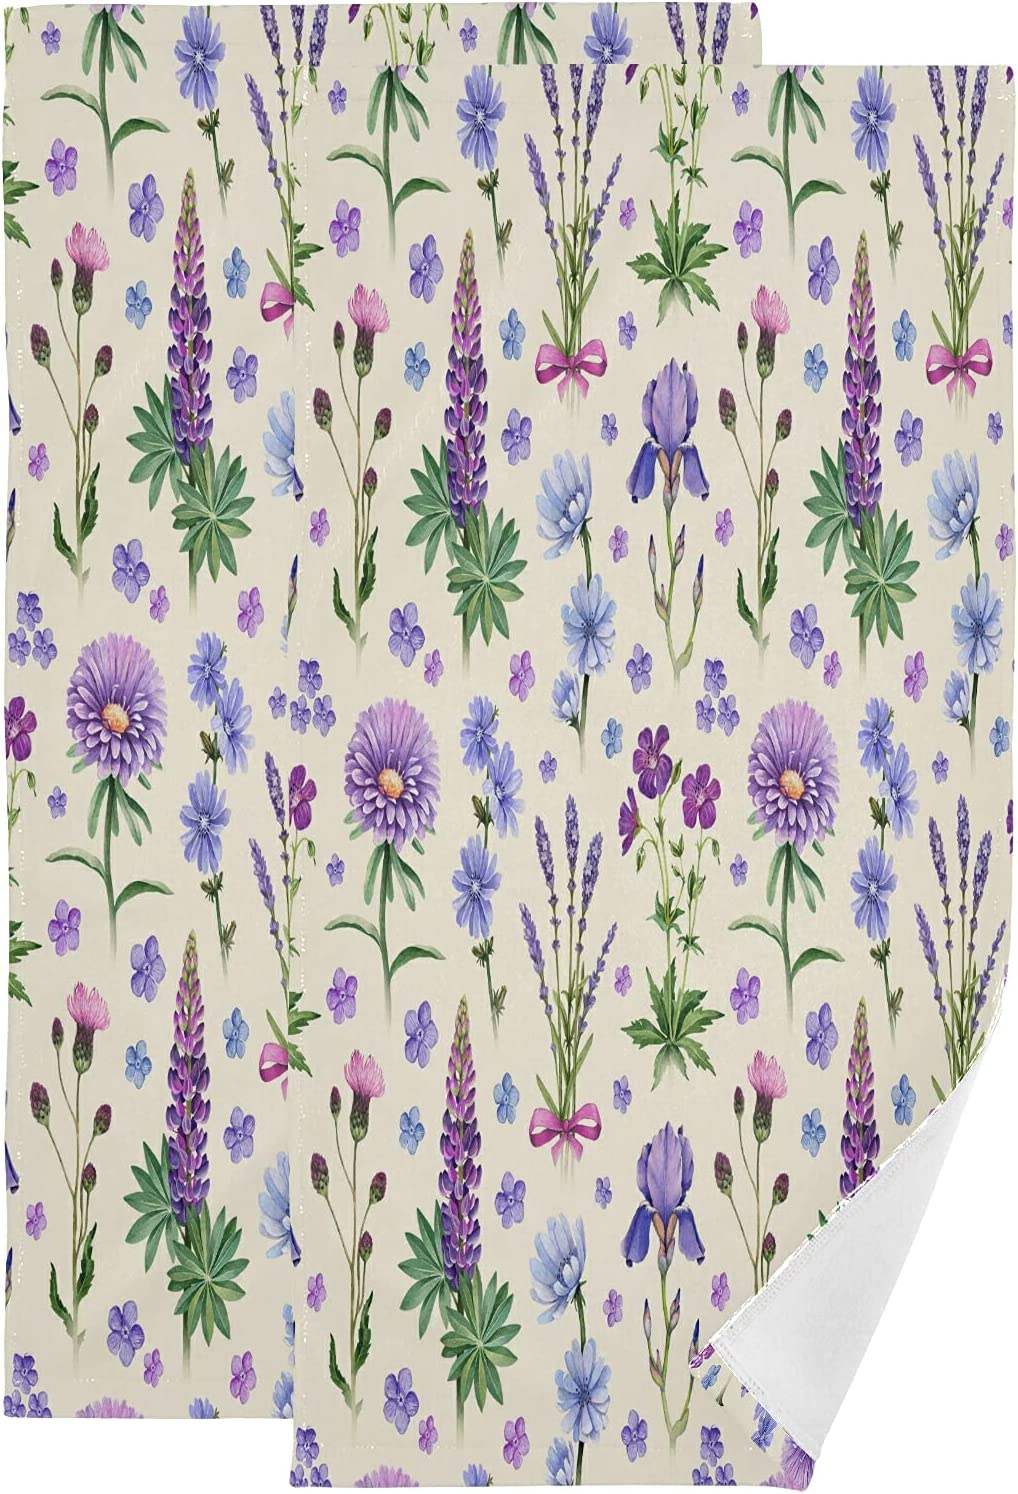 ALAZA 35% OFF Watercolor Direct sale of manufacturer Lavender Hand Soft Decorative Towels Absorbent